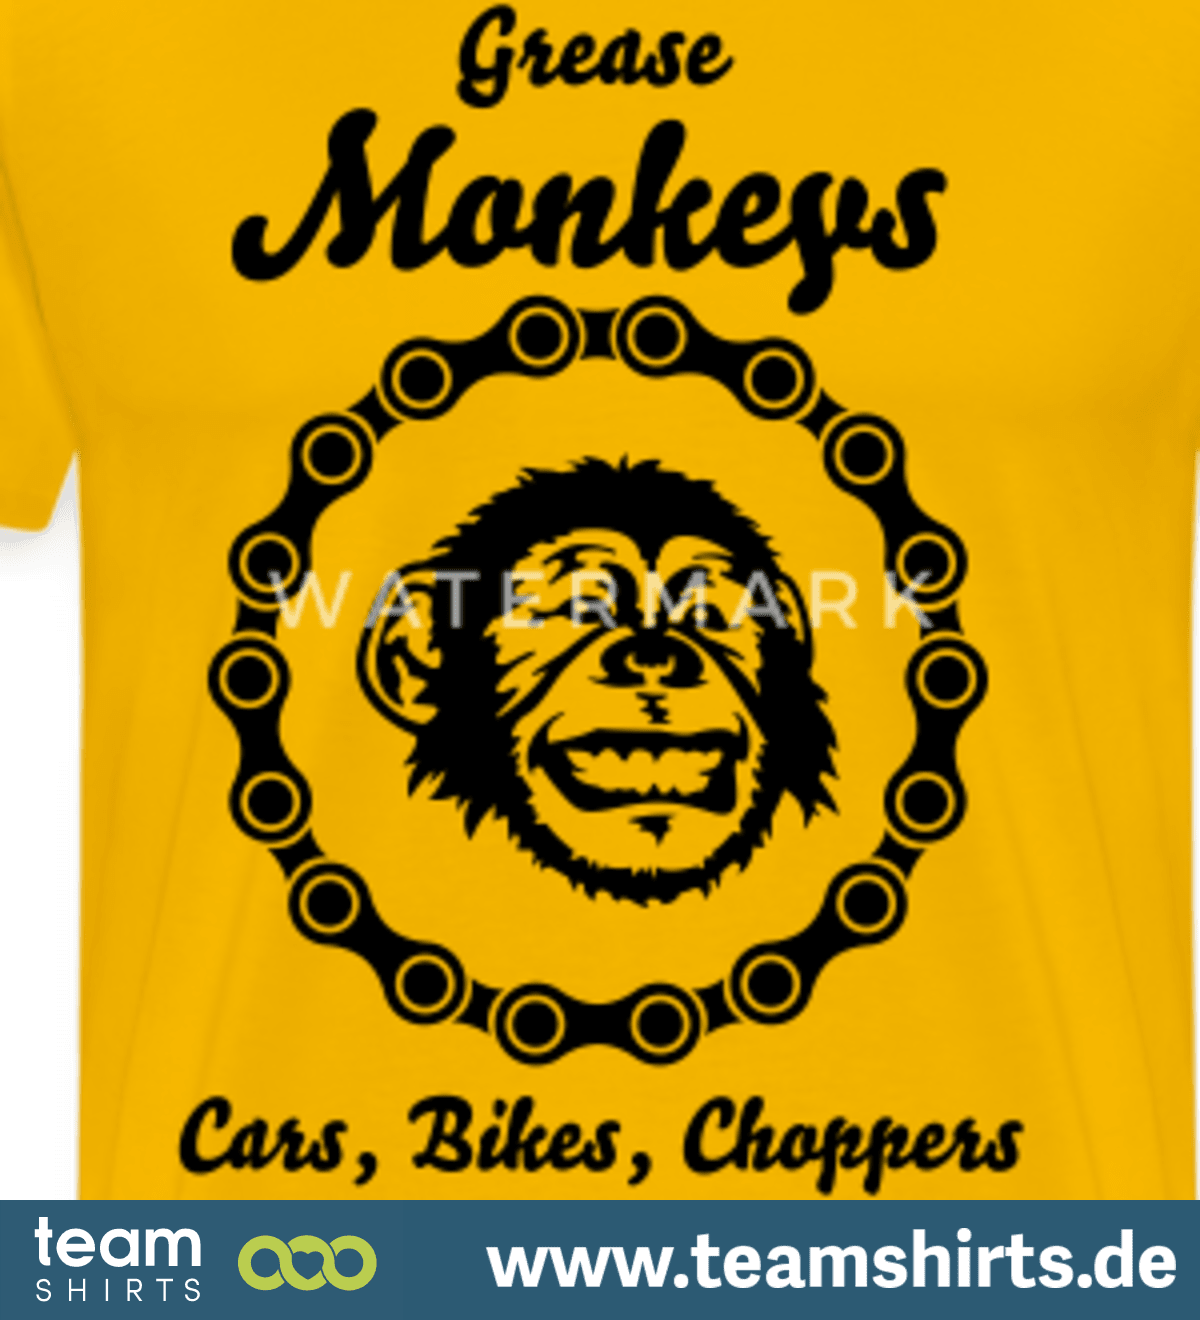 CARS, BIKES, CHOPPERS